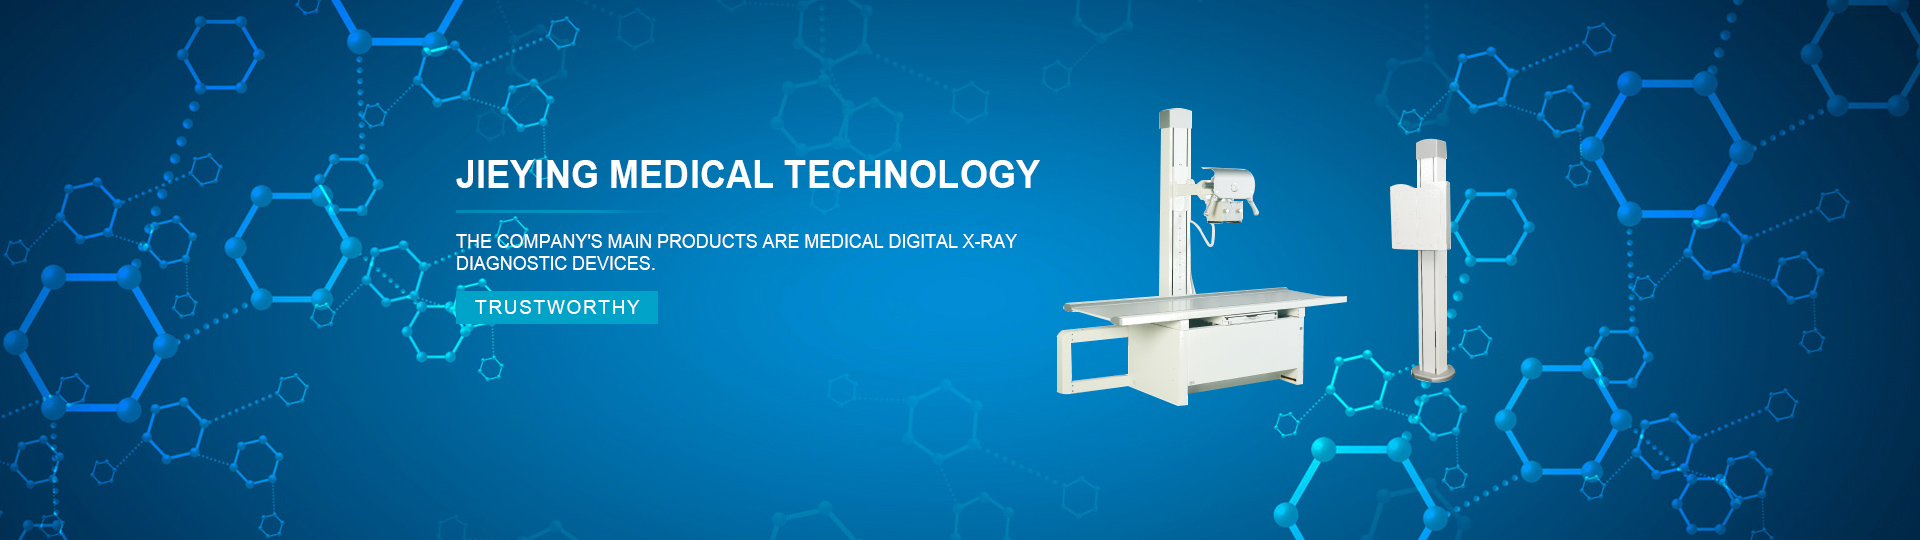 Shanghai Jieying Medical Technology Co., Ltd.